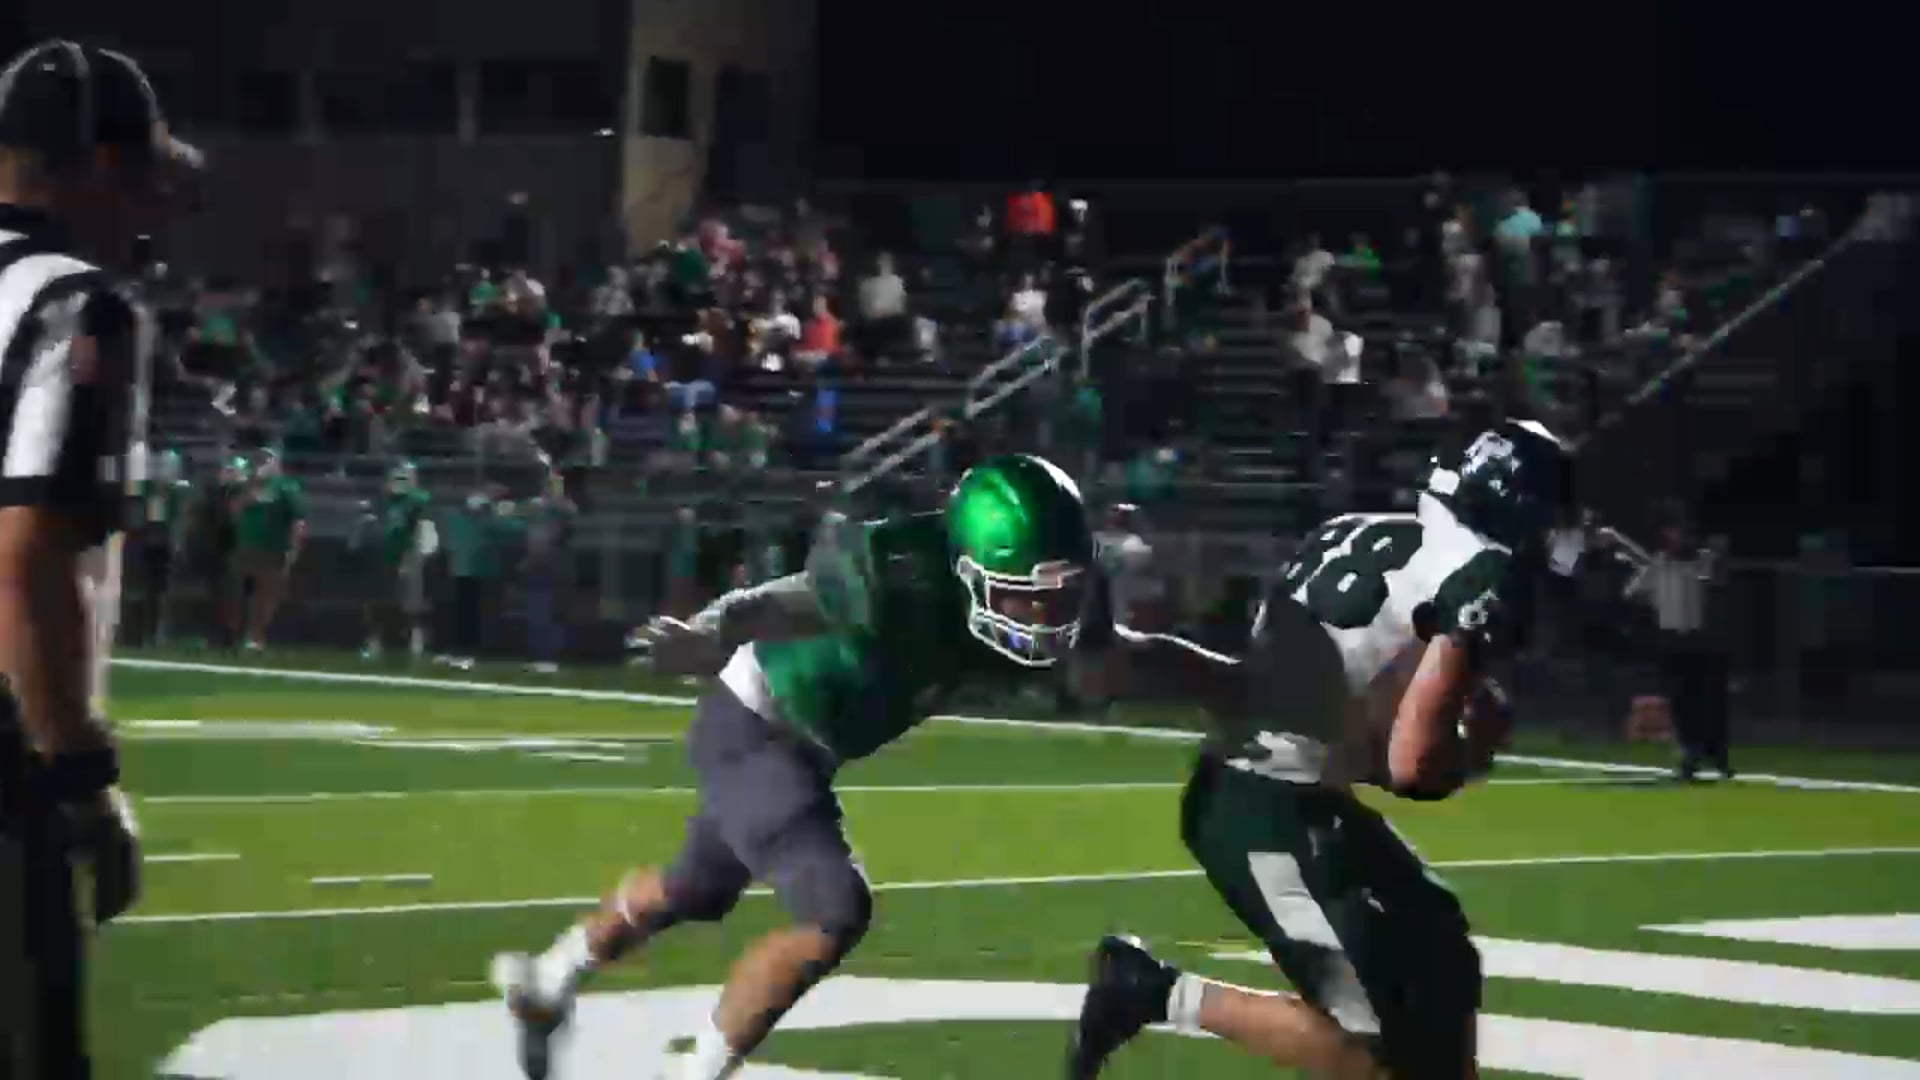 Football Hype Video